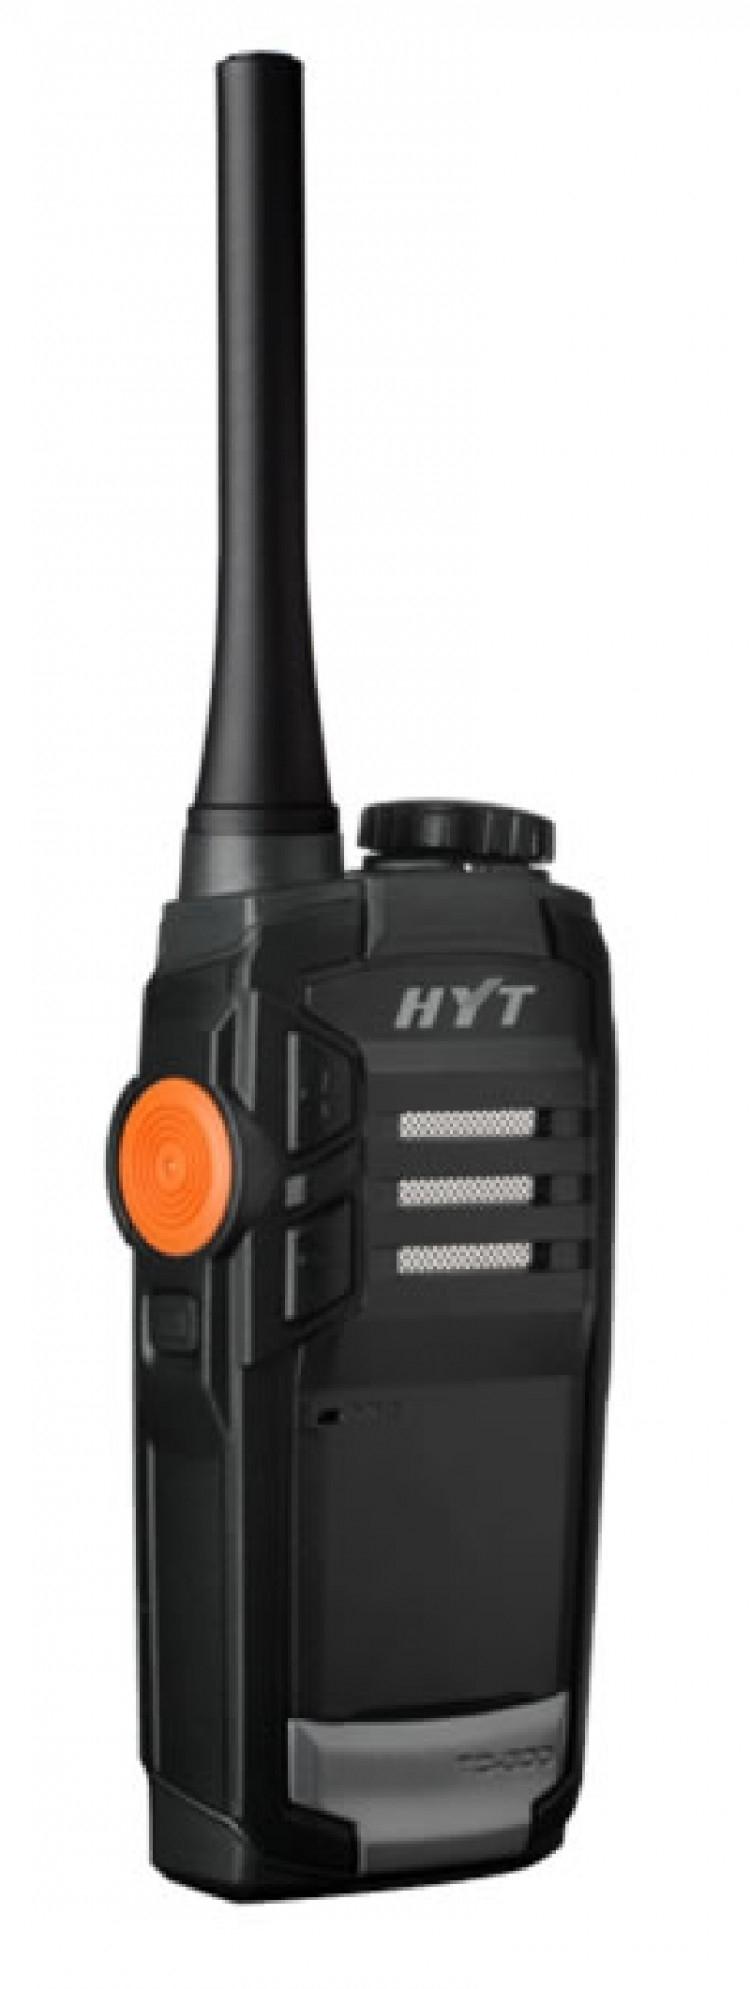 Портативная рация Hytera TC-320 2pcs universal car daytime running light led cob 12v drl auto driving front fog lamp white bulb waterproof 6000k